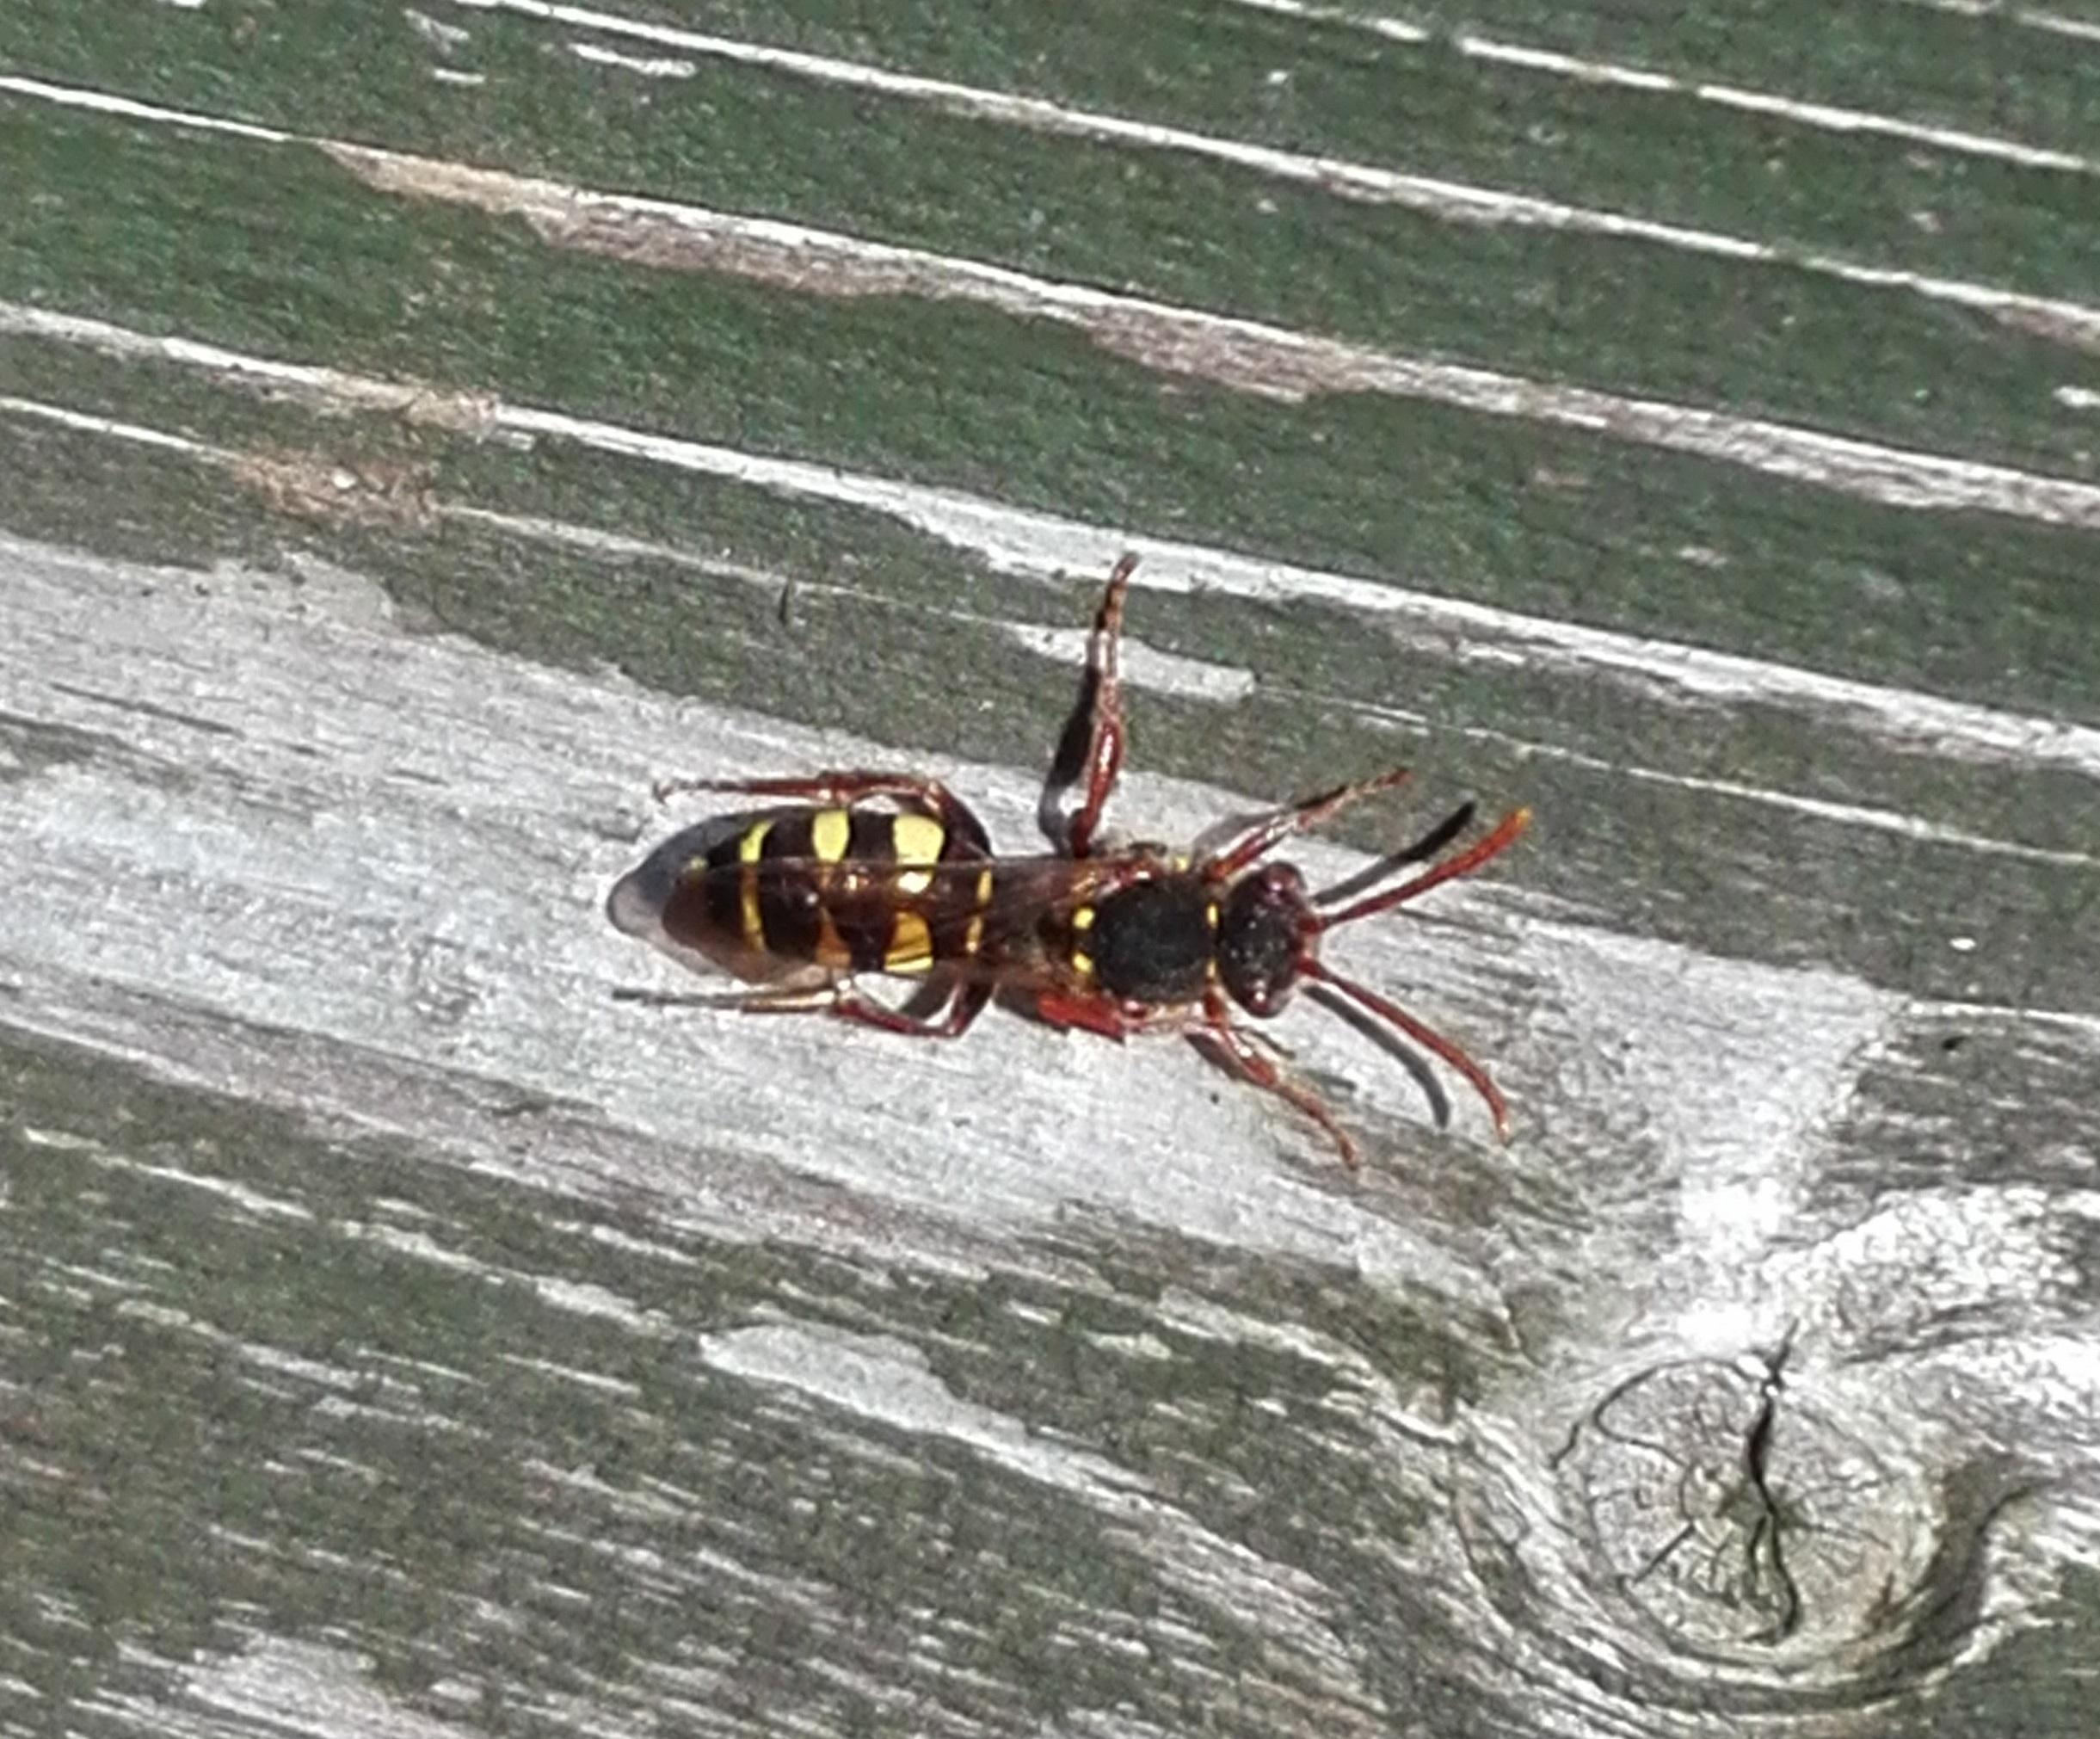 #481 Marsham's Nomad Bee (Nomada marshamella)